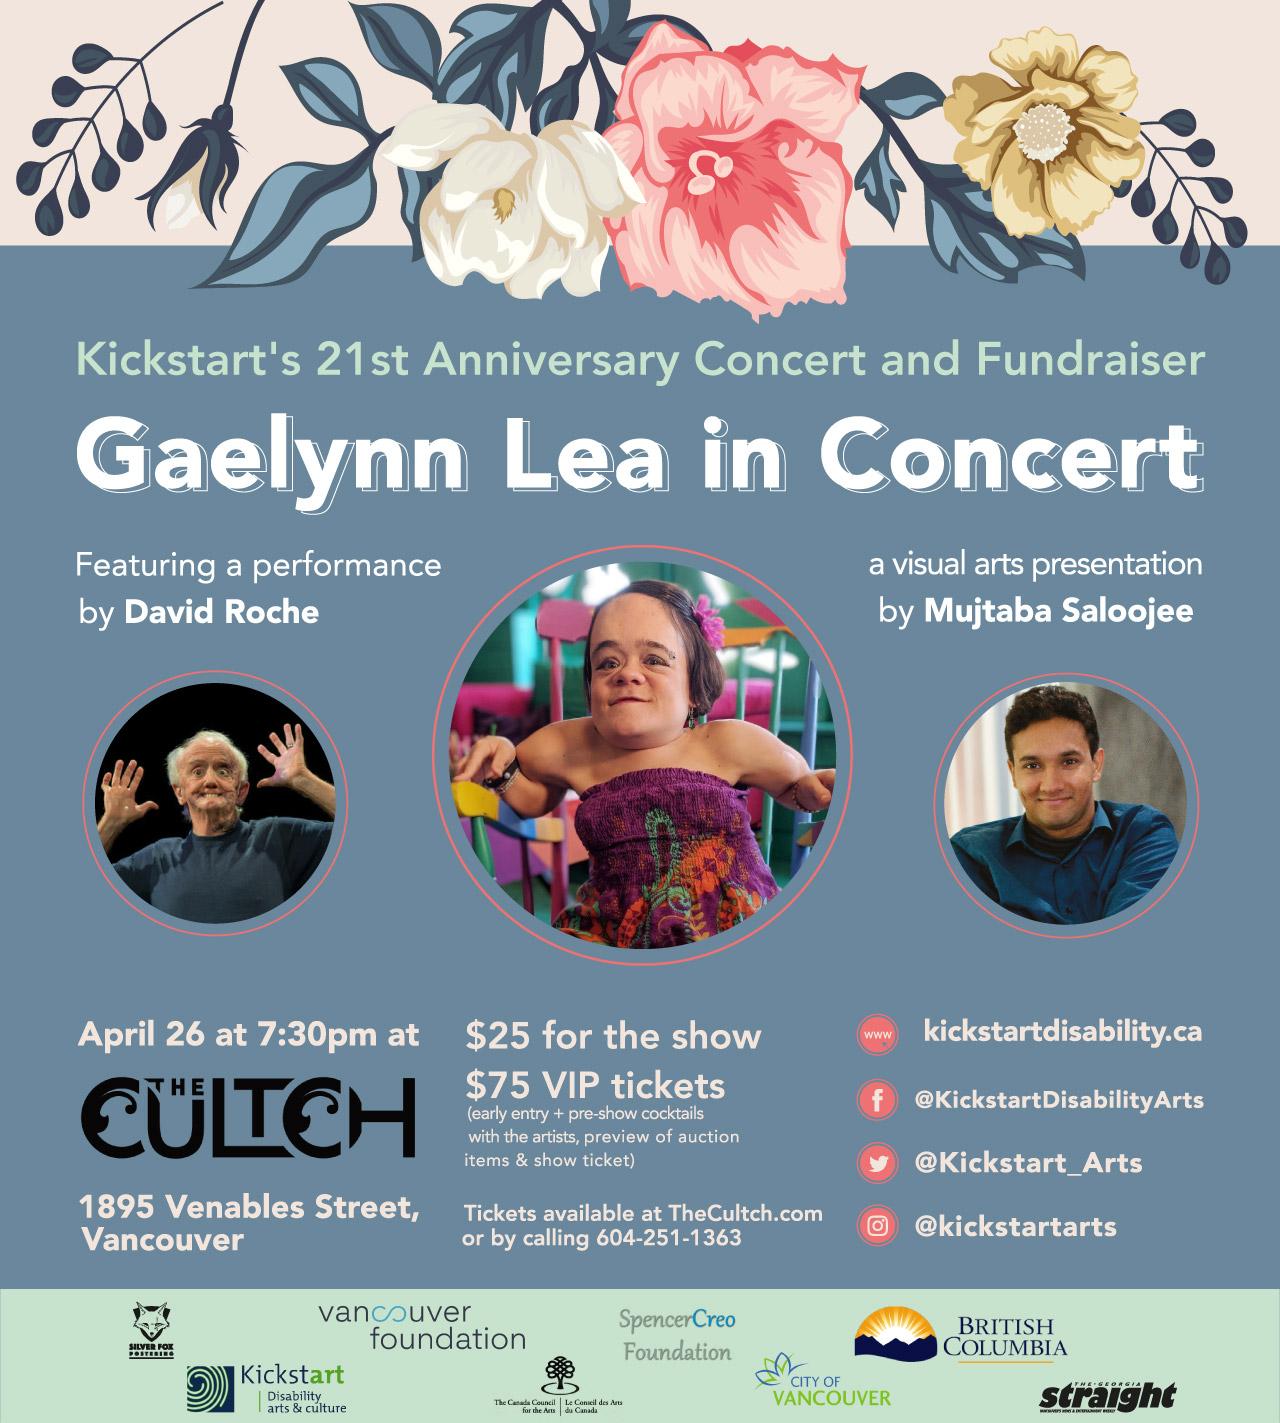 Kickstart's 21st Anniversary Concert and Fundraiser